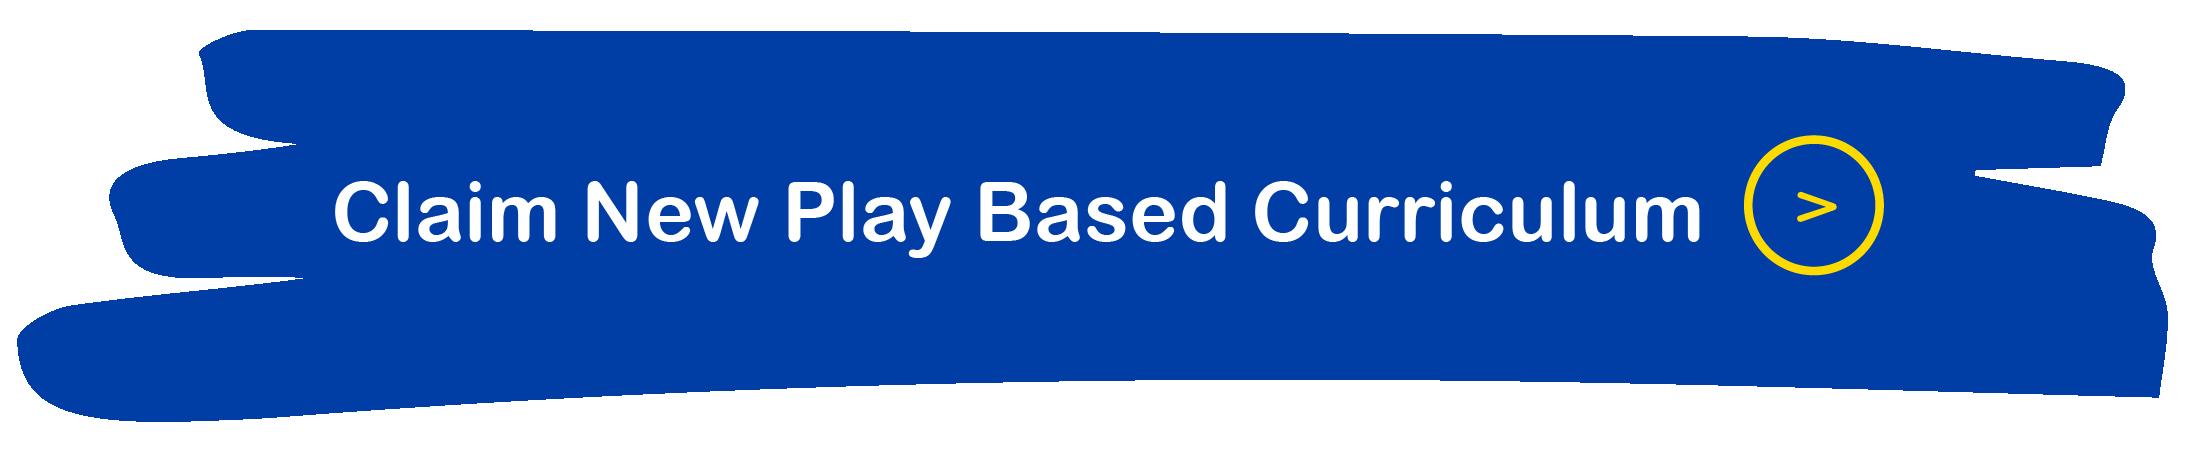 Claim New Play Based Curriculum